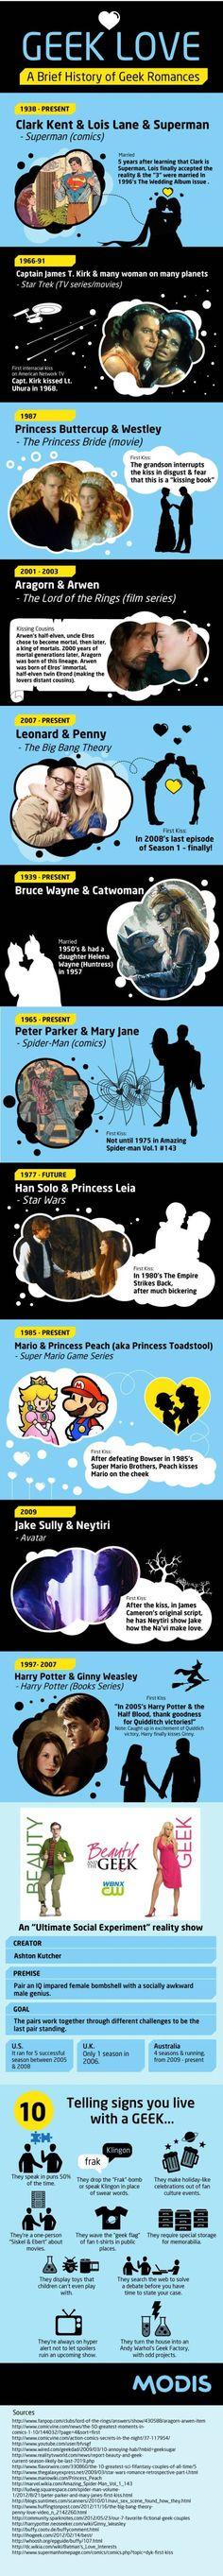 Geek Love: A Brief History of Geek Romances - Infographic — GeekTyrant